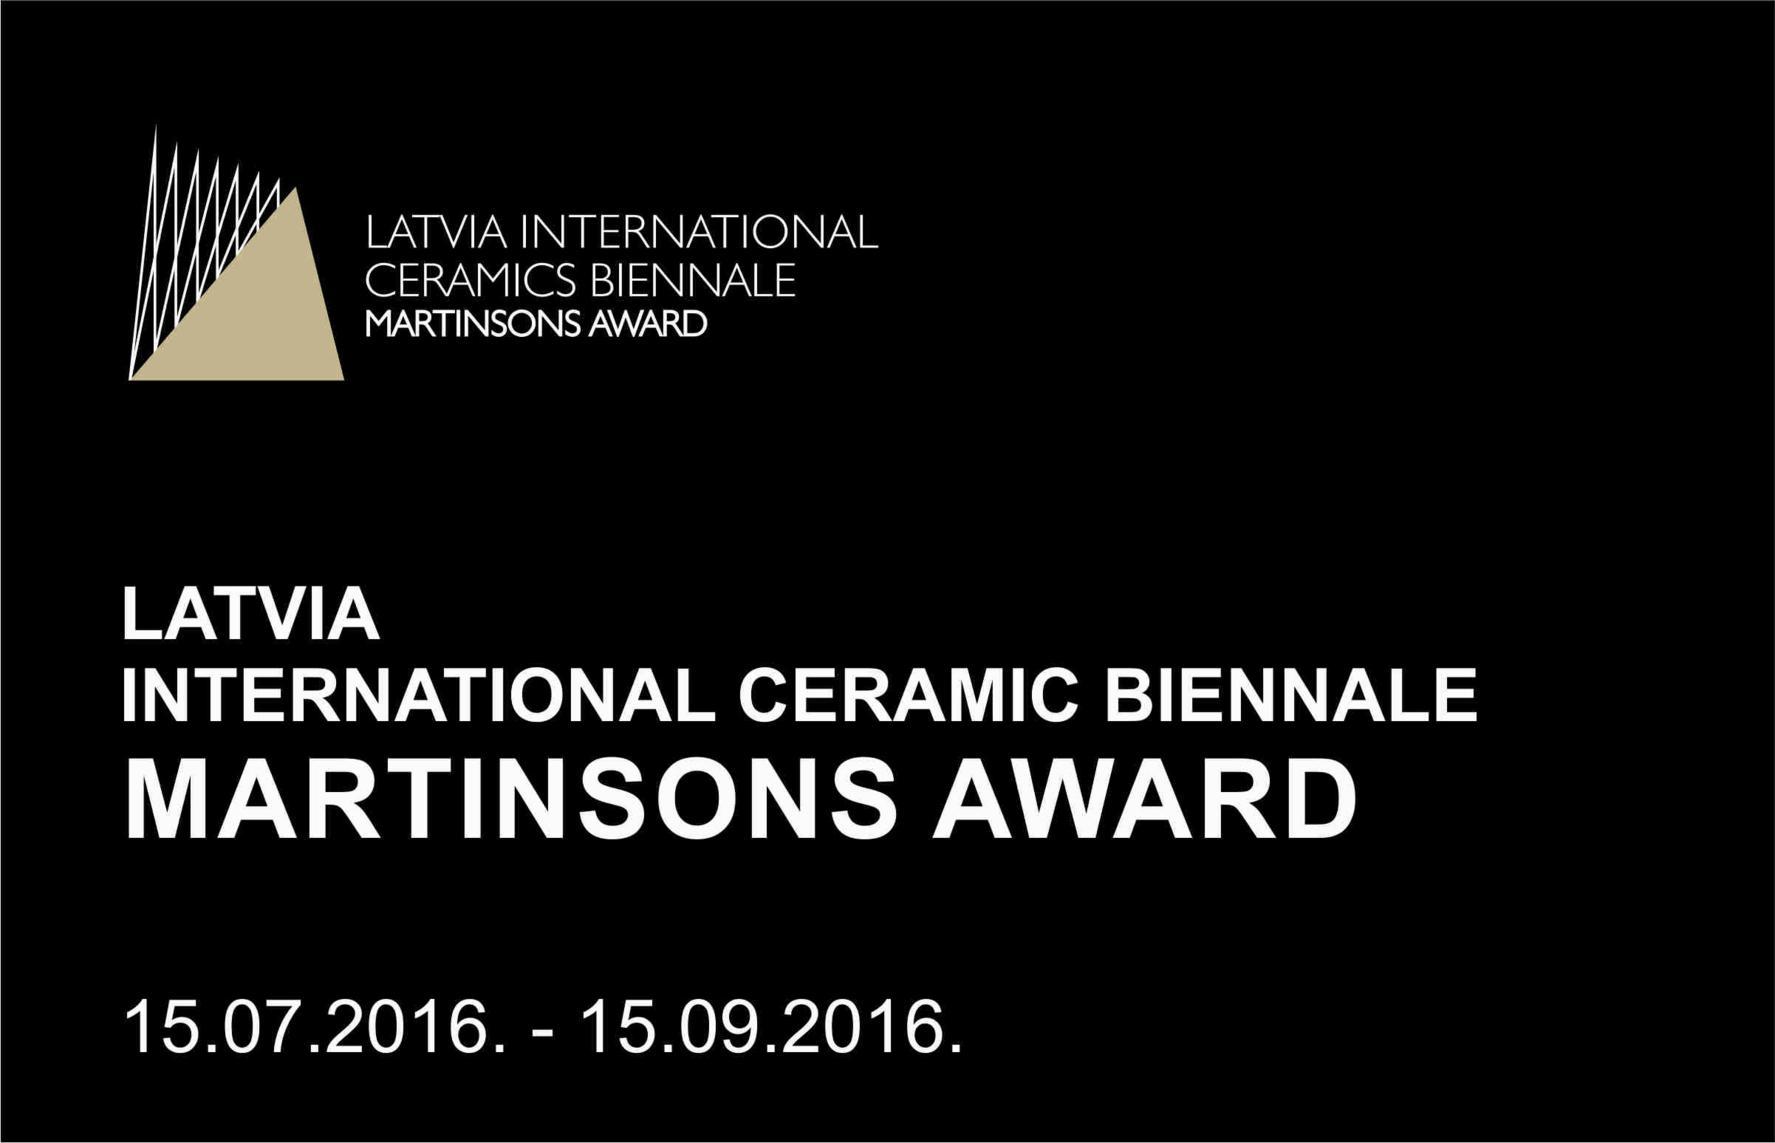 MARTINSONS AWARD Latvia International Ceramics Biennale